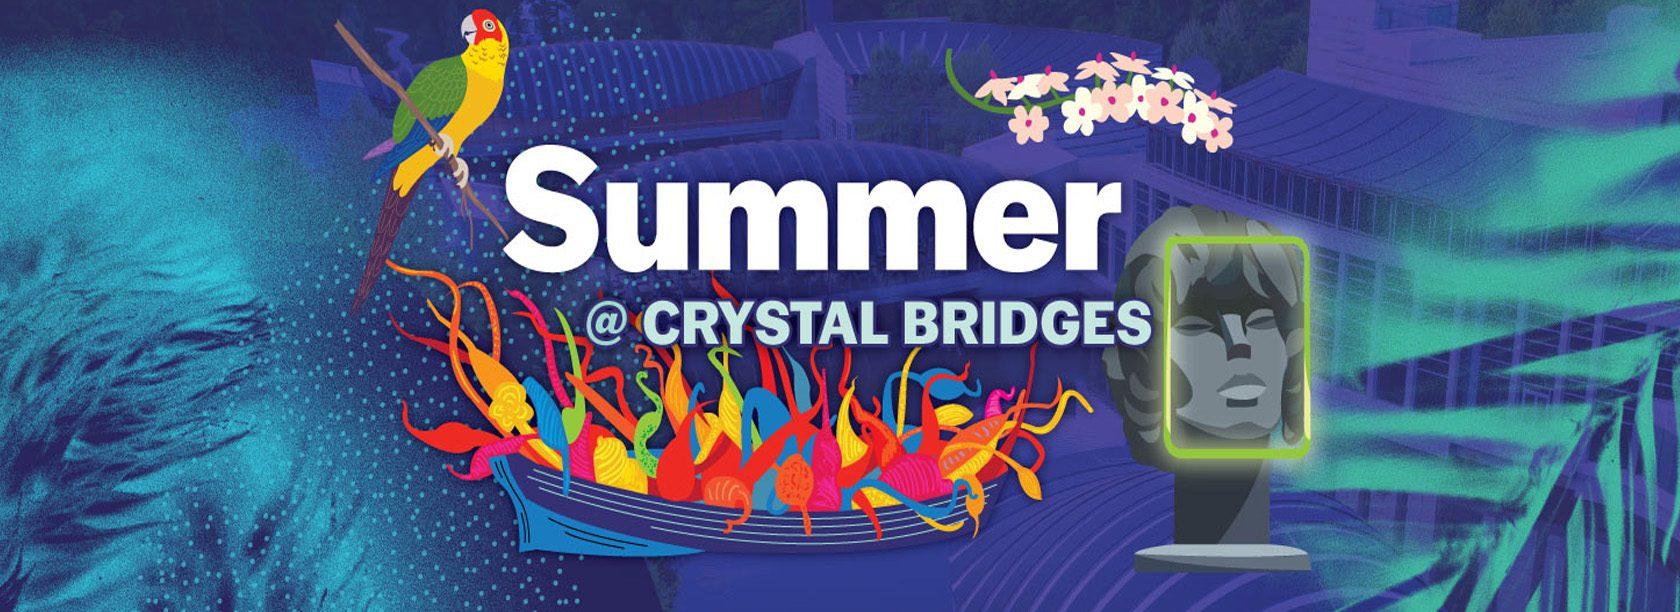 Summer At Crystal Bridges